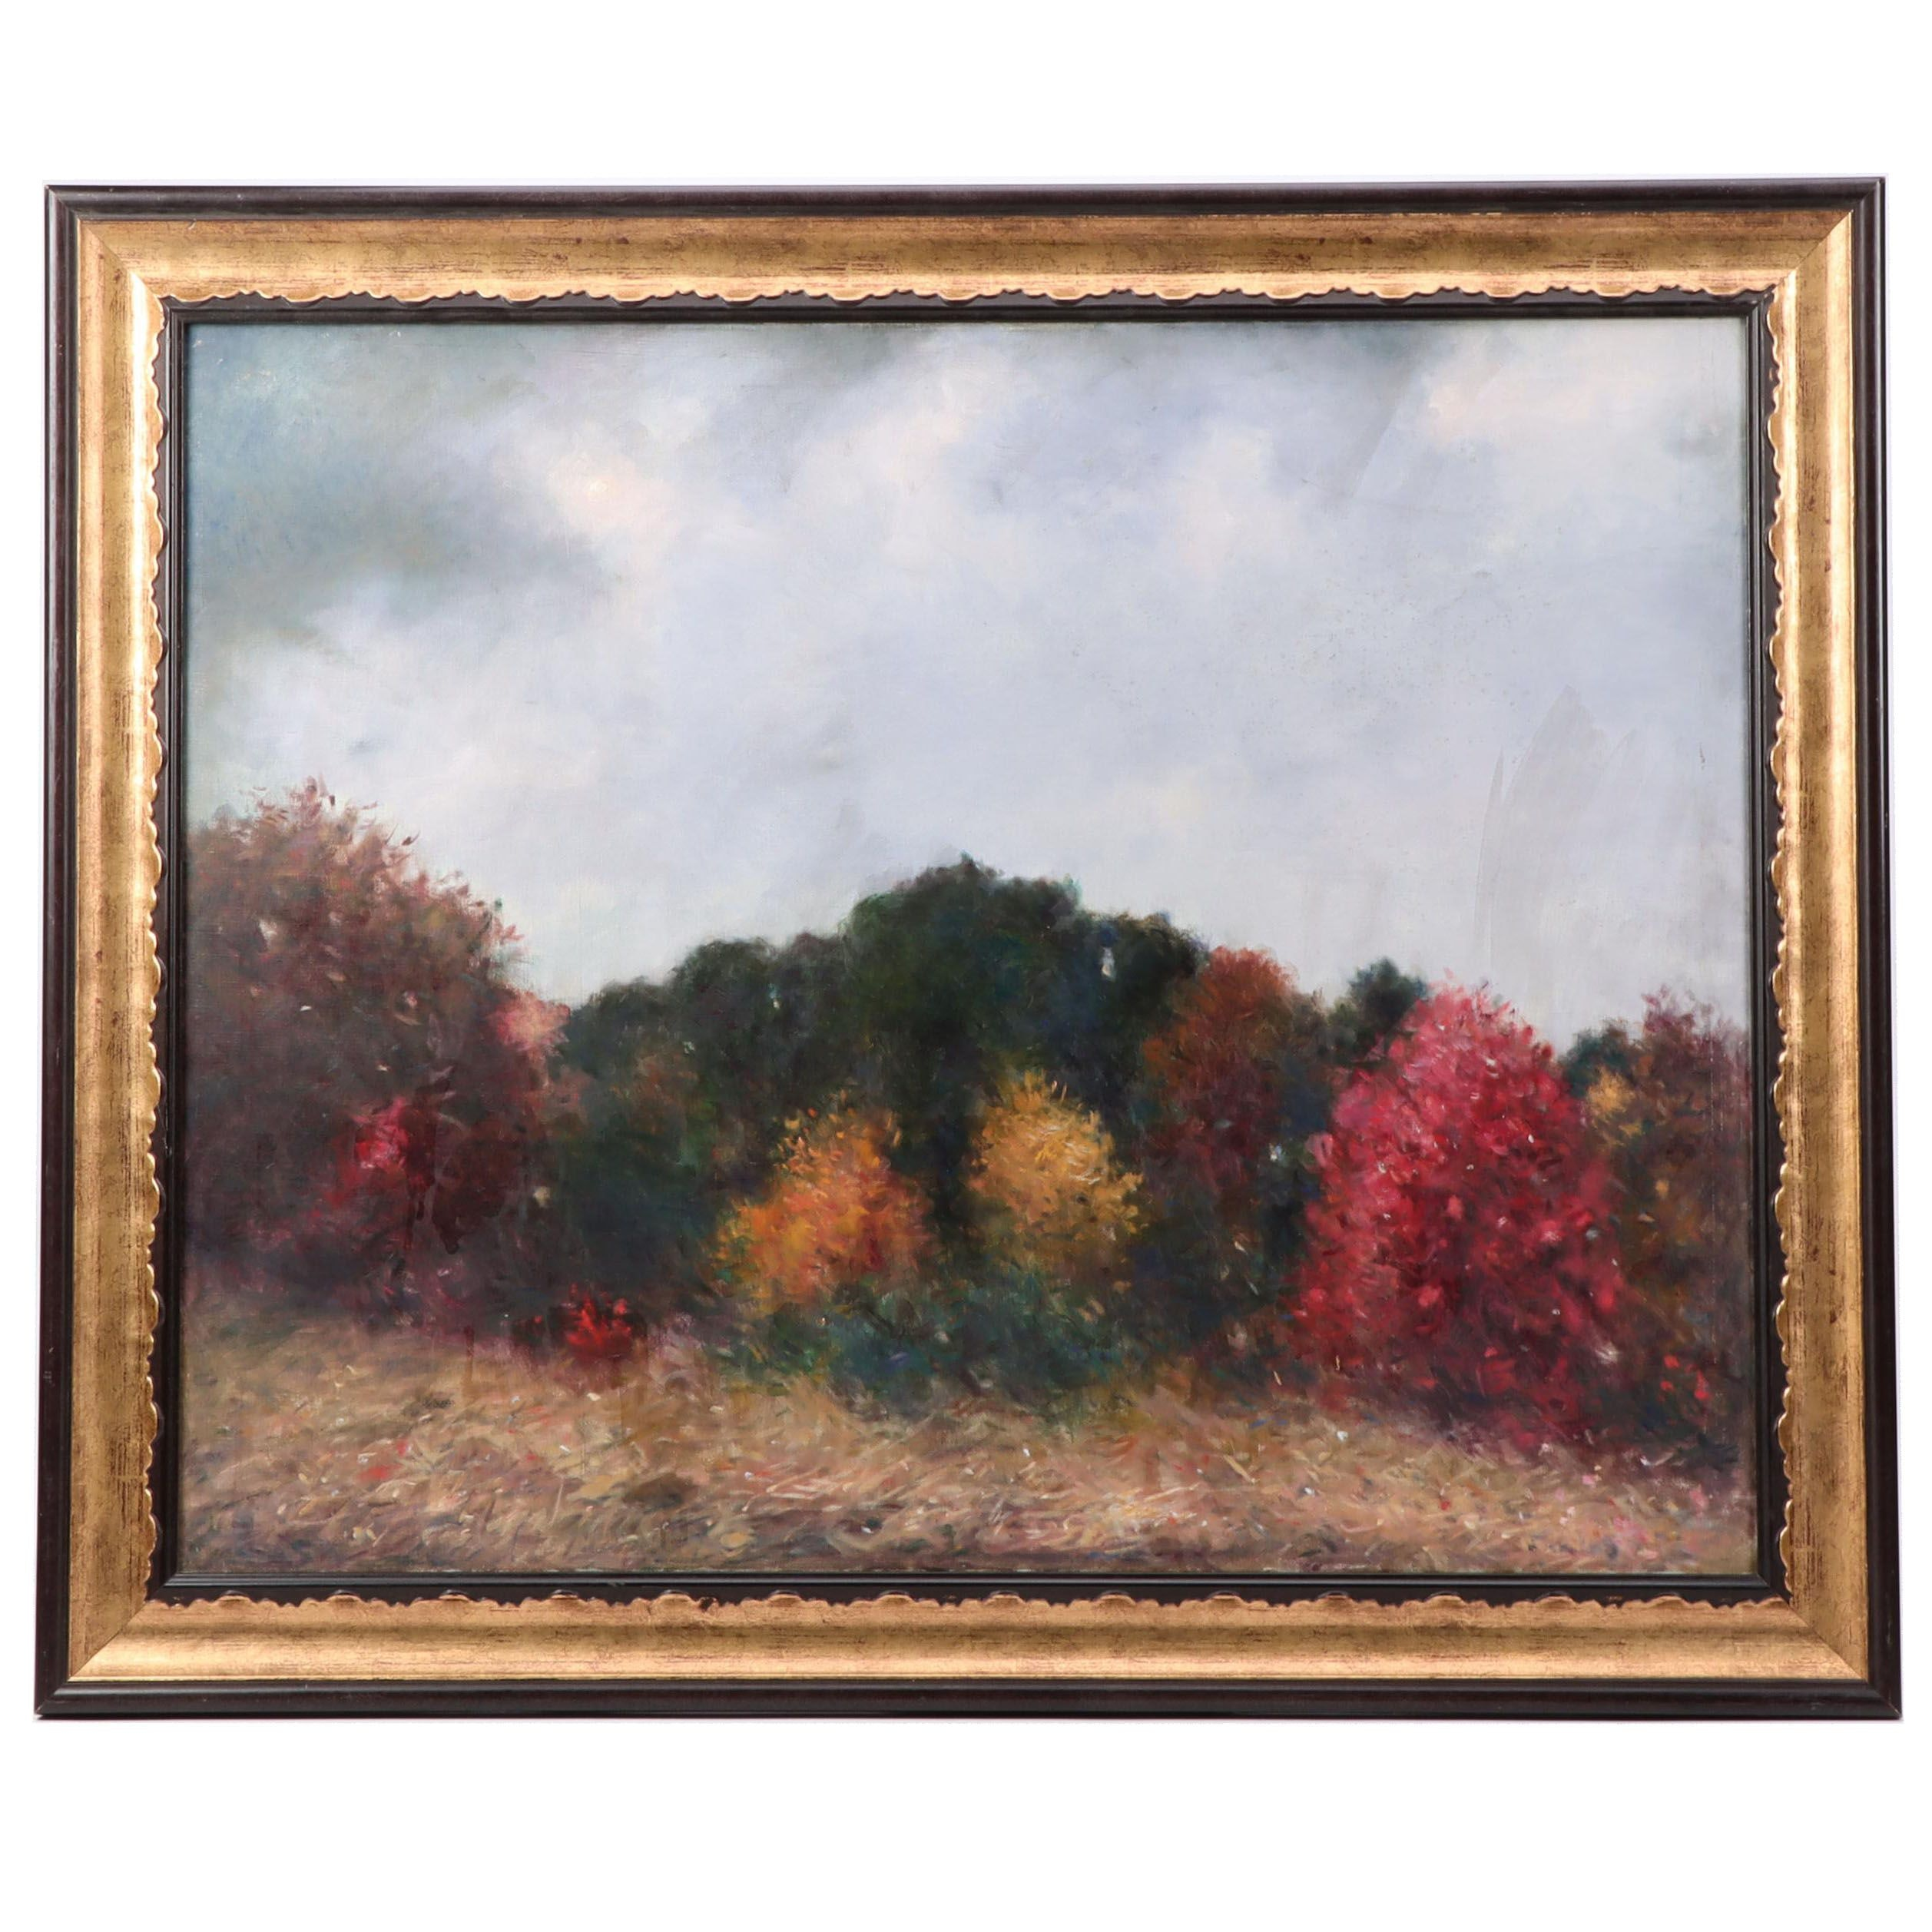 Dana Ripley Pond Landscape Oil Painting